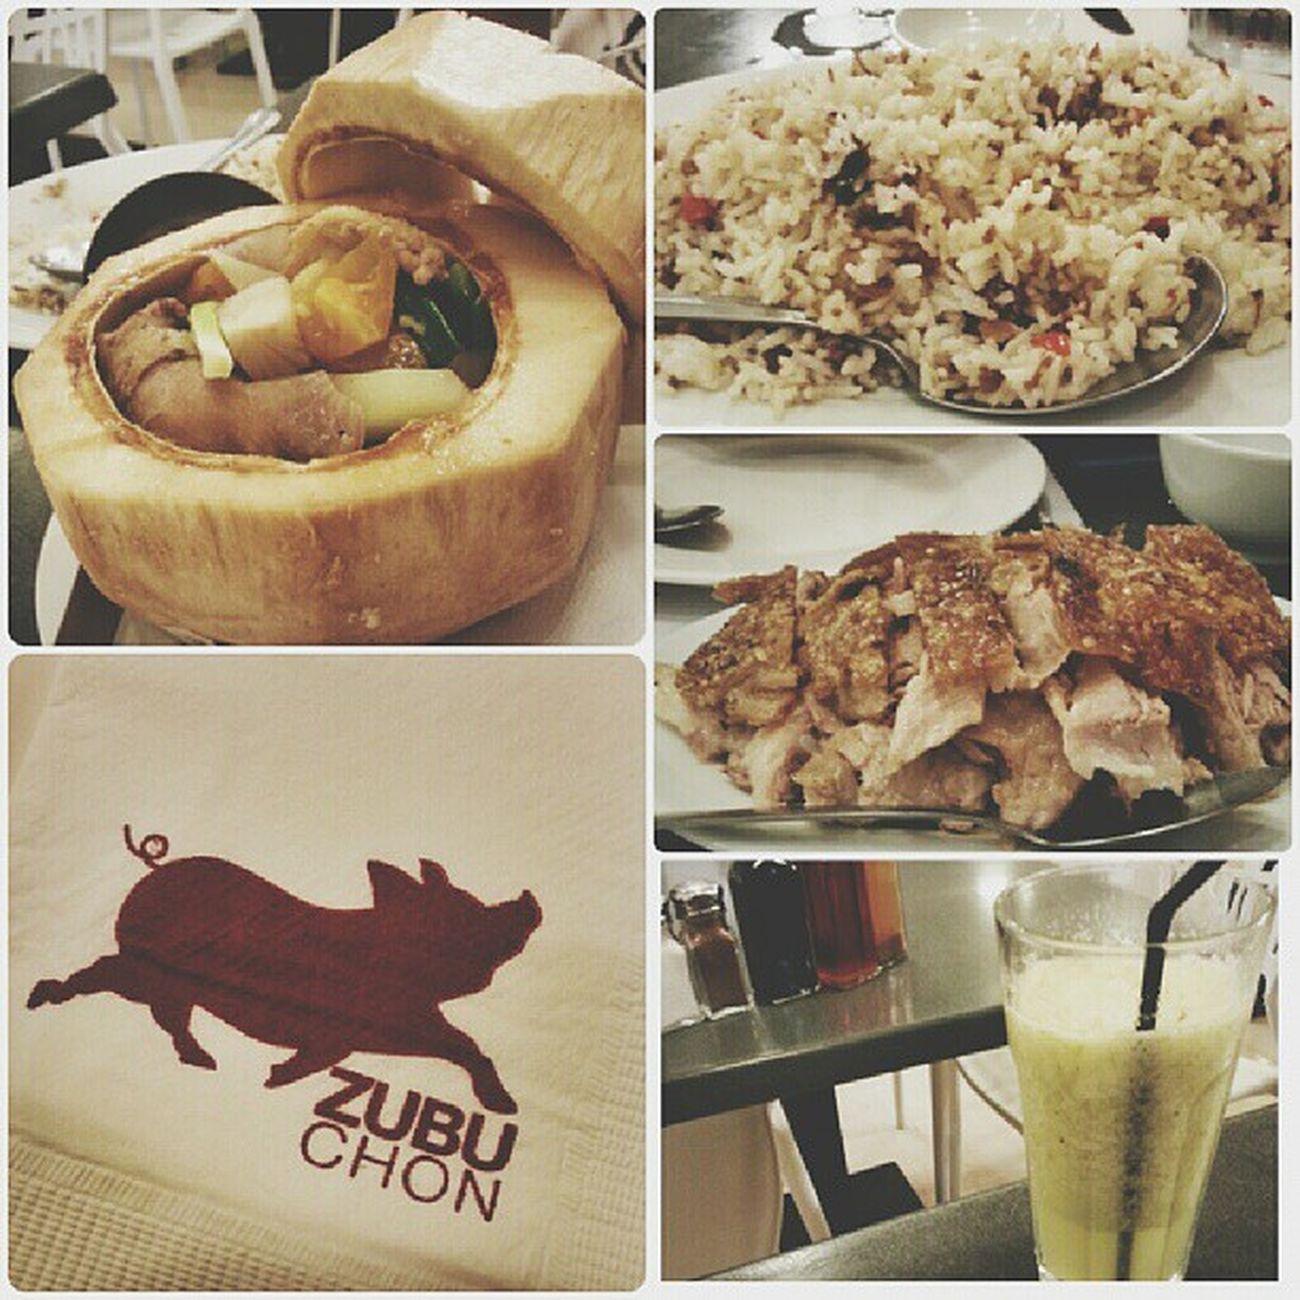 One of the famous Cebu Lechon :) Iba (Kamias) shake FTW ! ZUBUchon  Cebu Igerscebu Foodporn putokbatok amlodipine LDL instabilbil